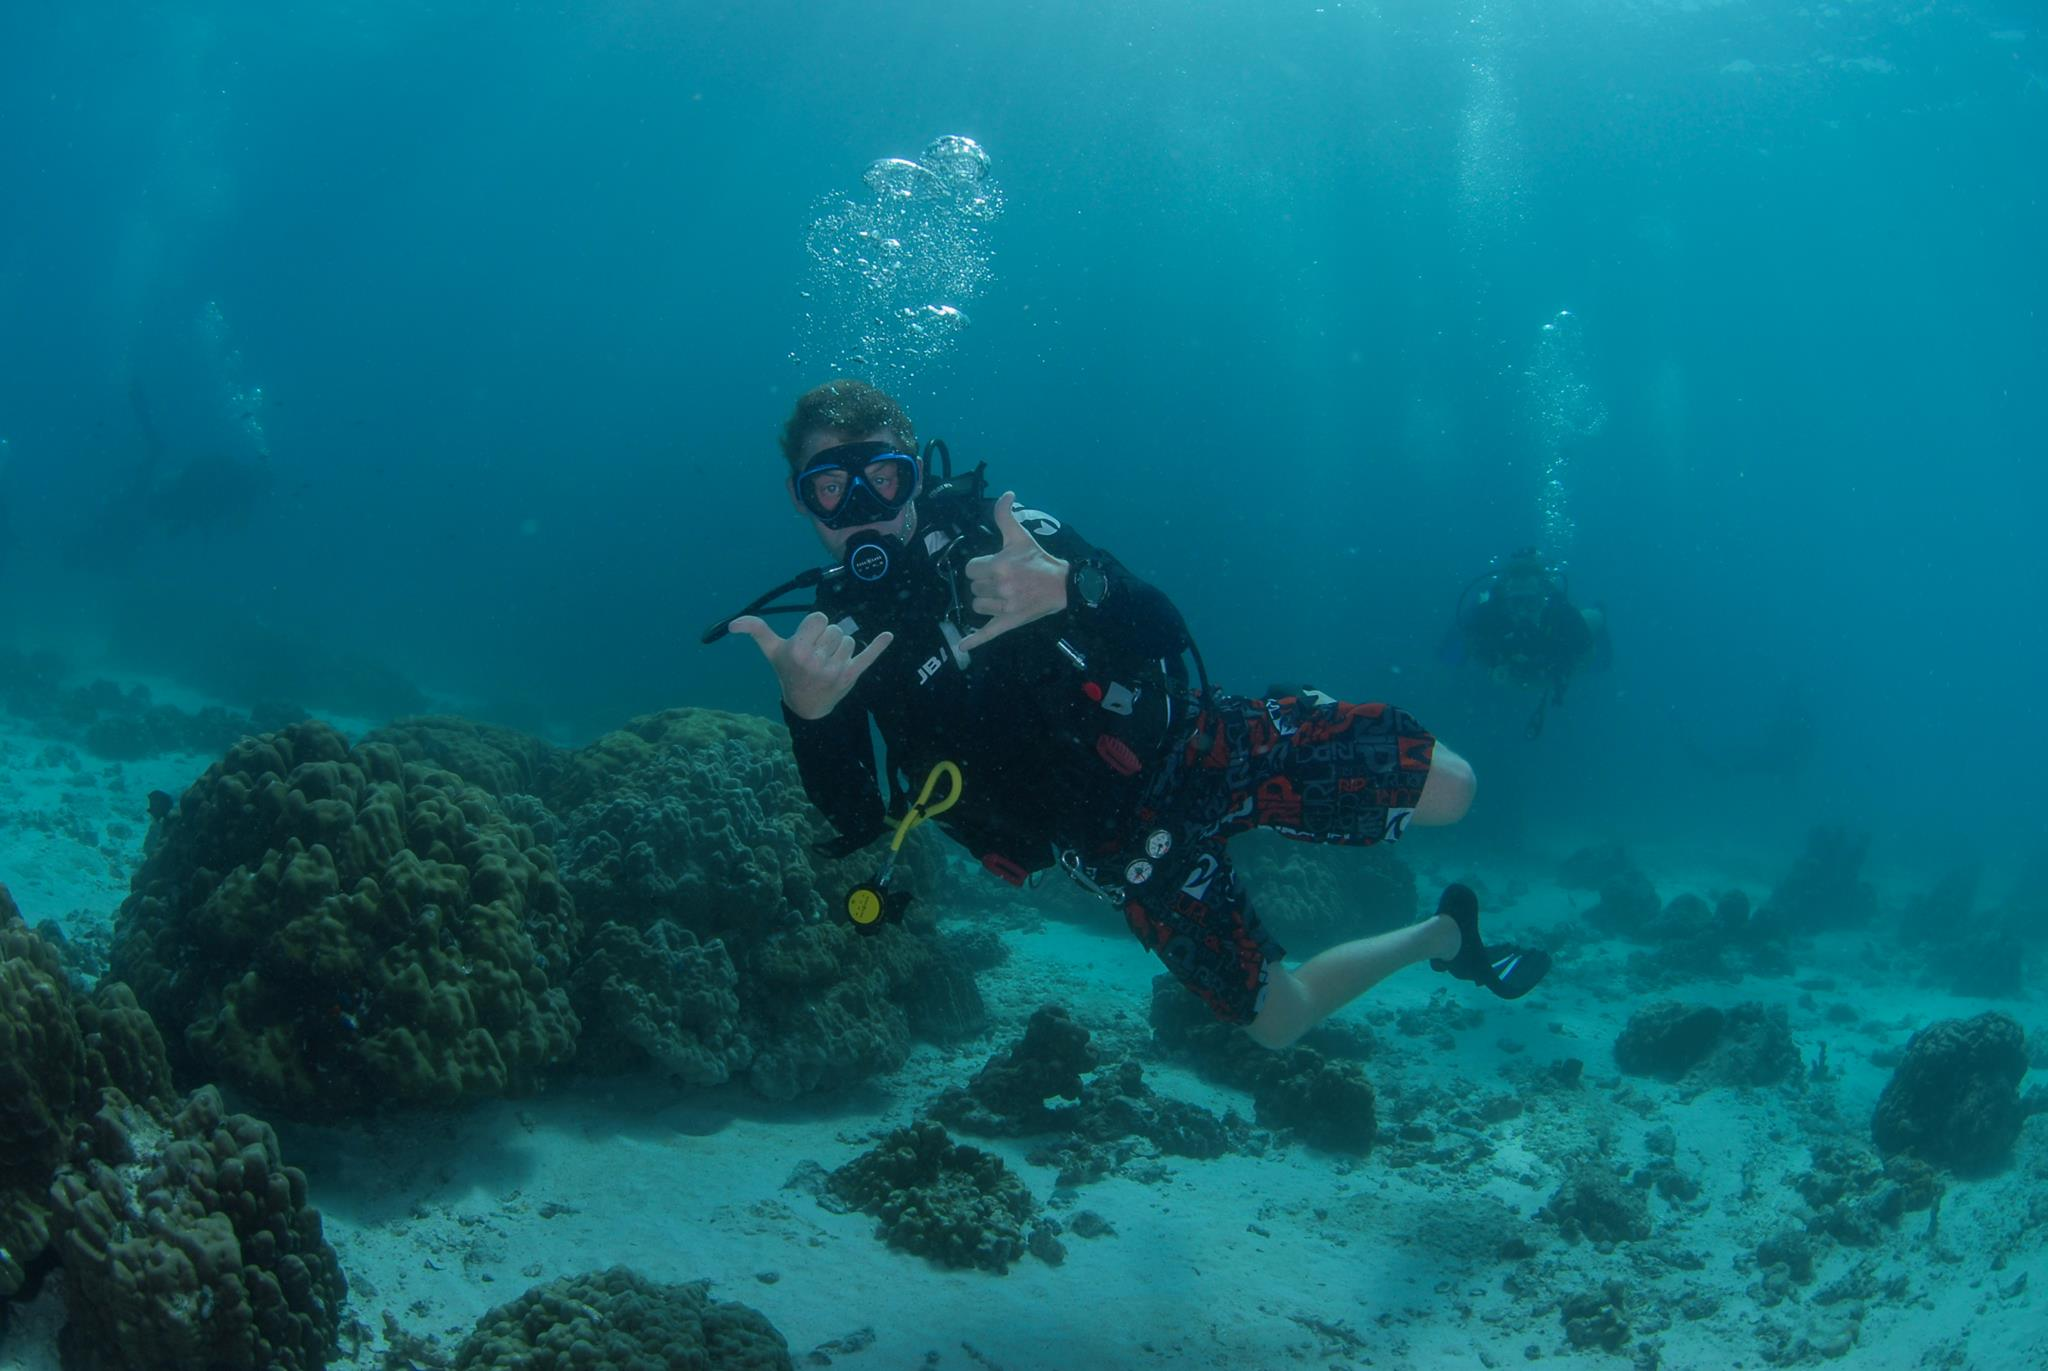 patrik dykning9